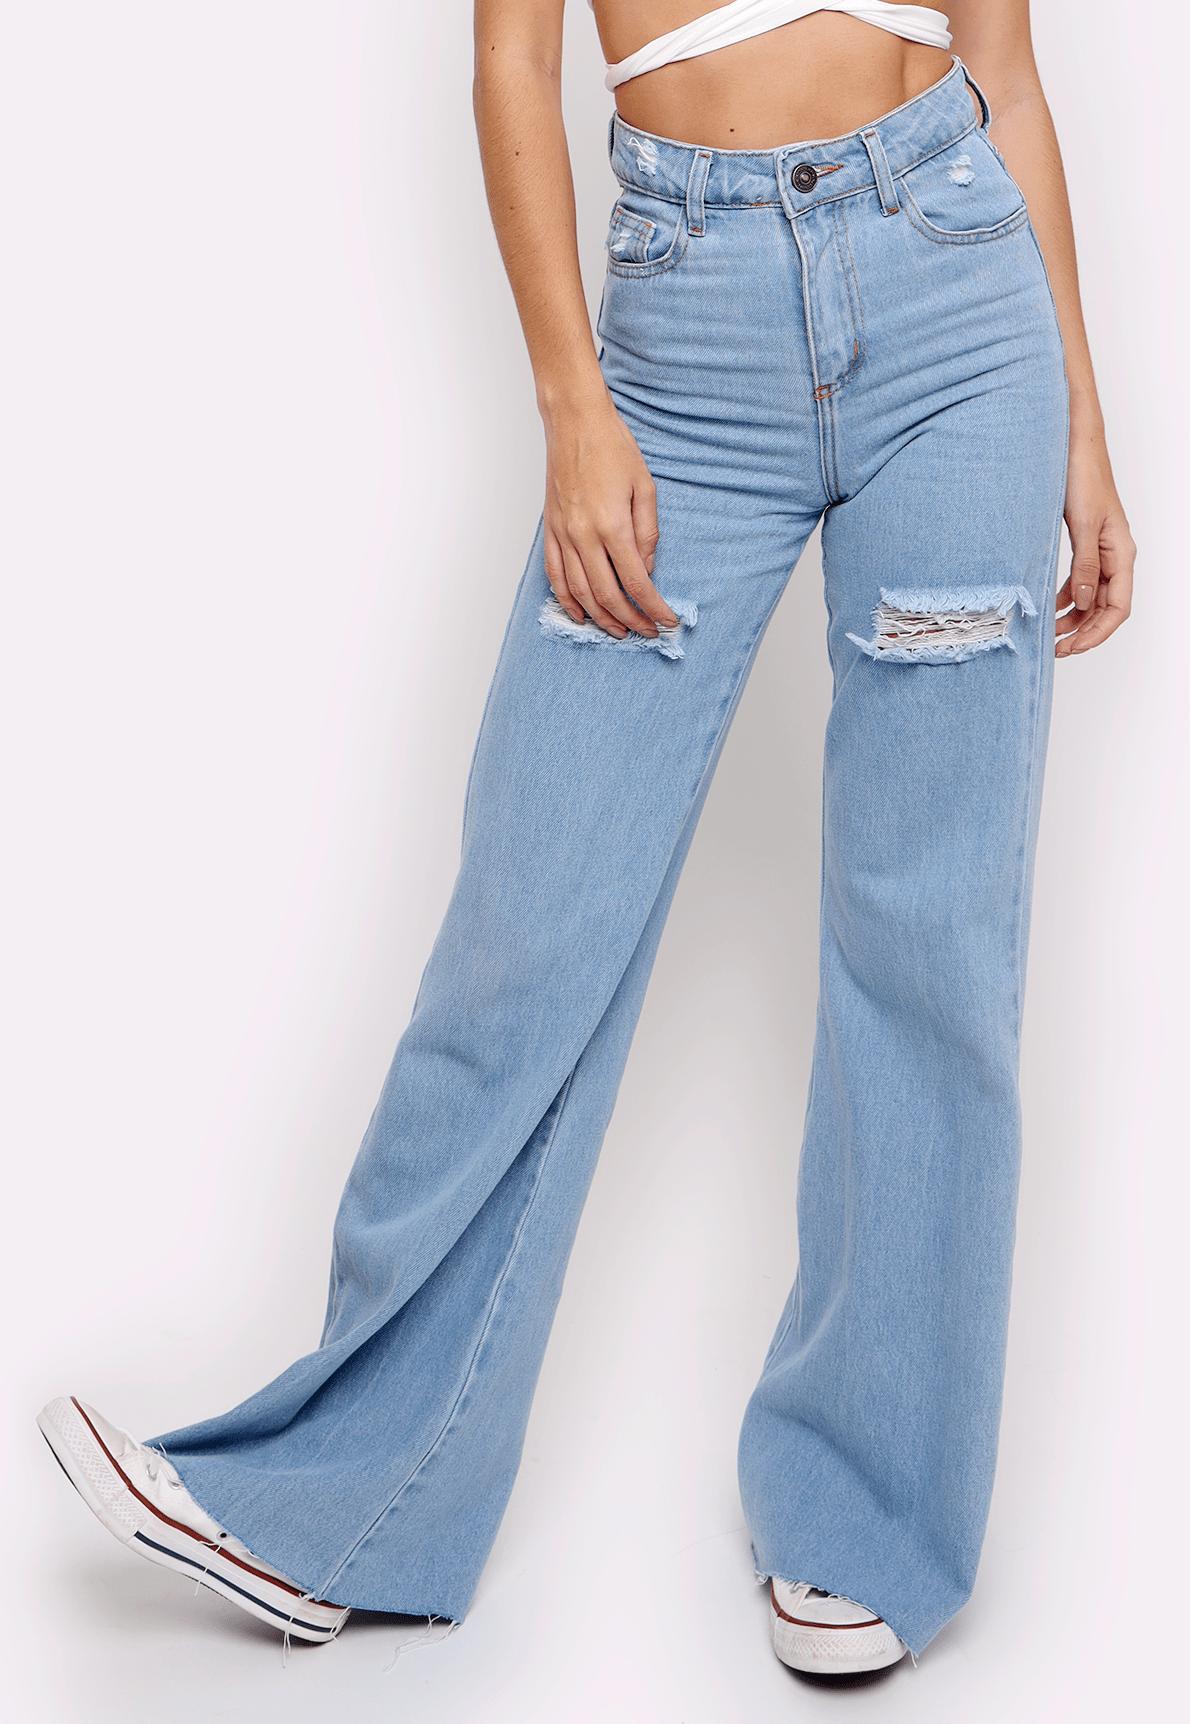 35492-calca-jeans-reset-mundo-lolita-03